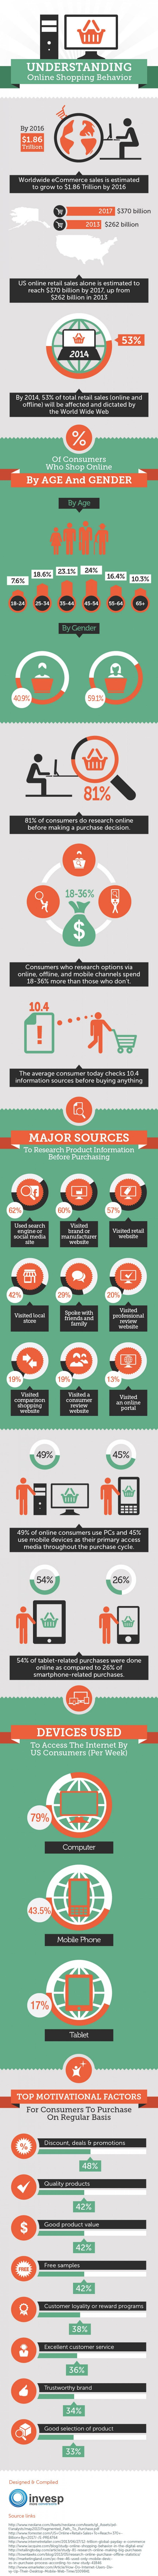 Understanding online shopping behavior